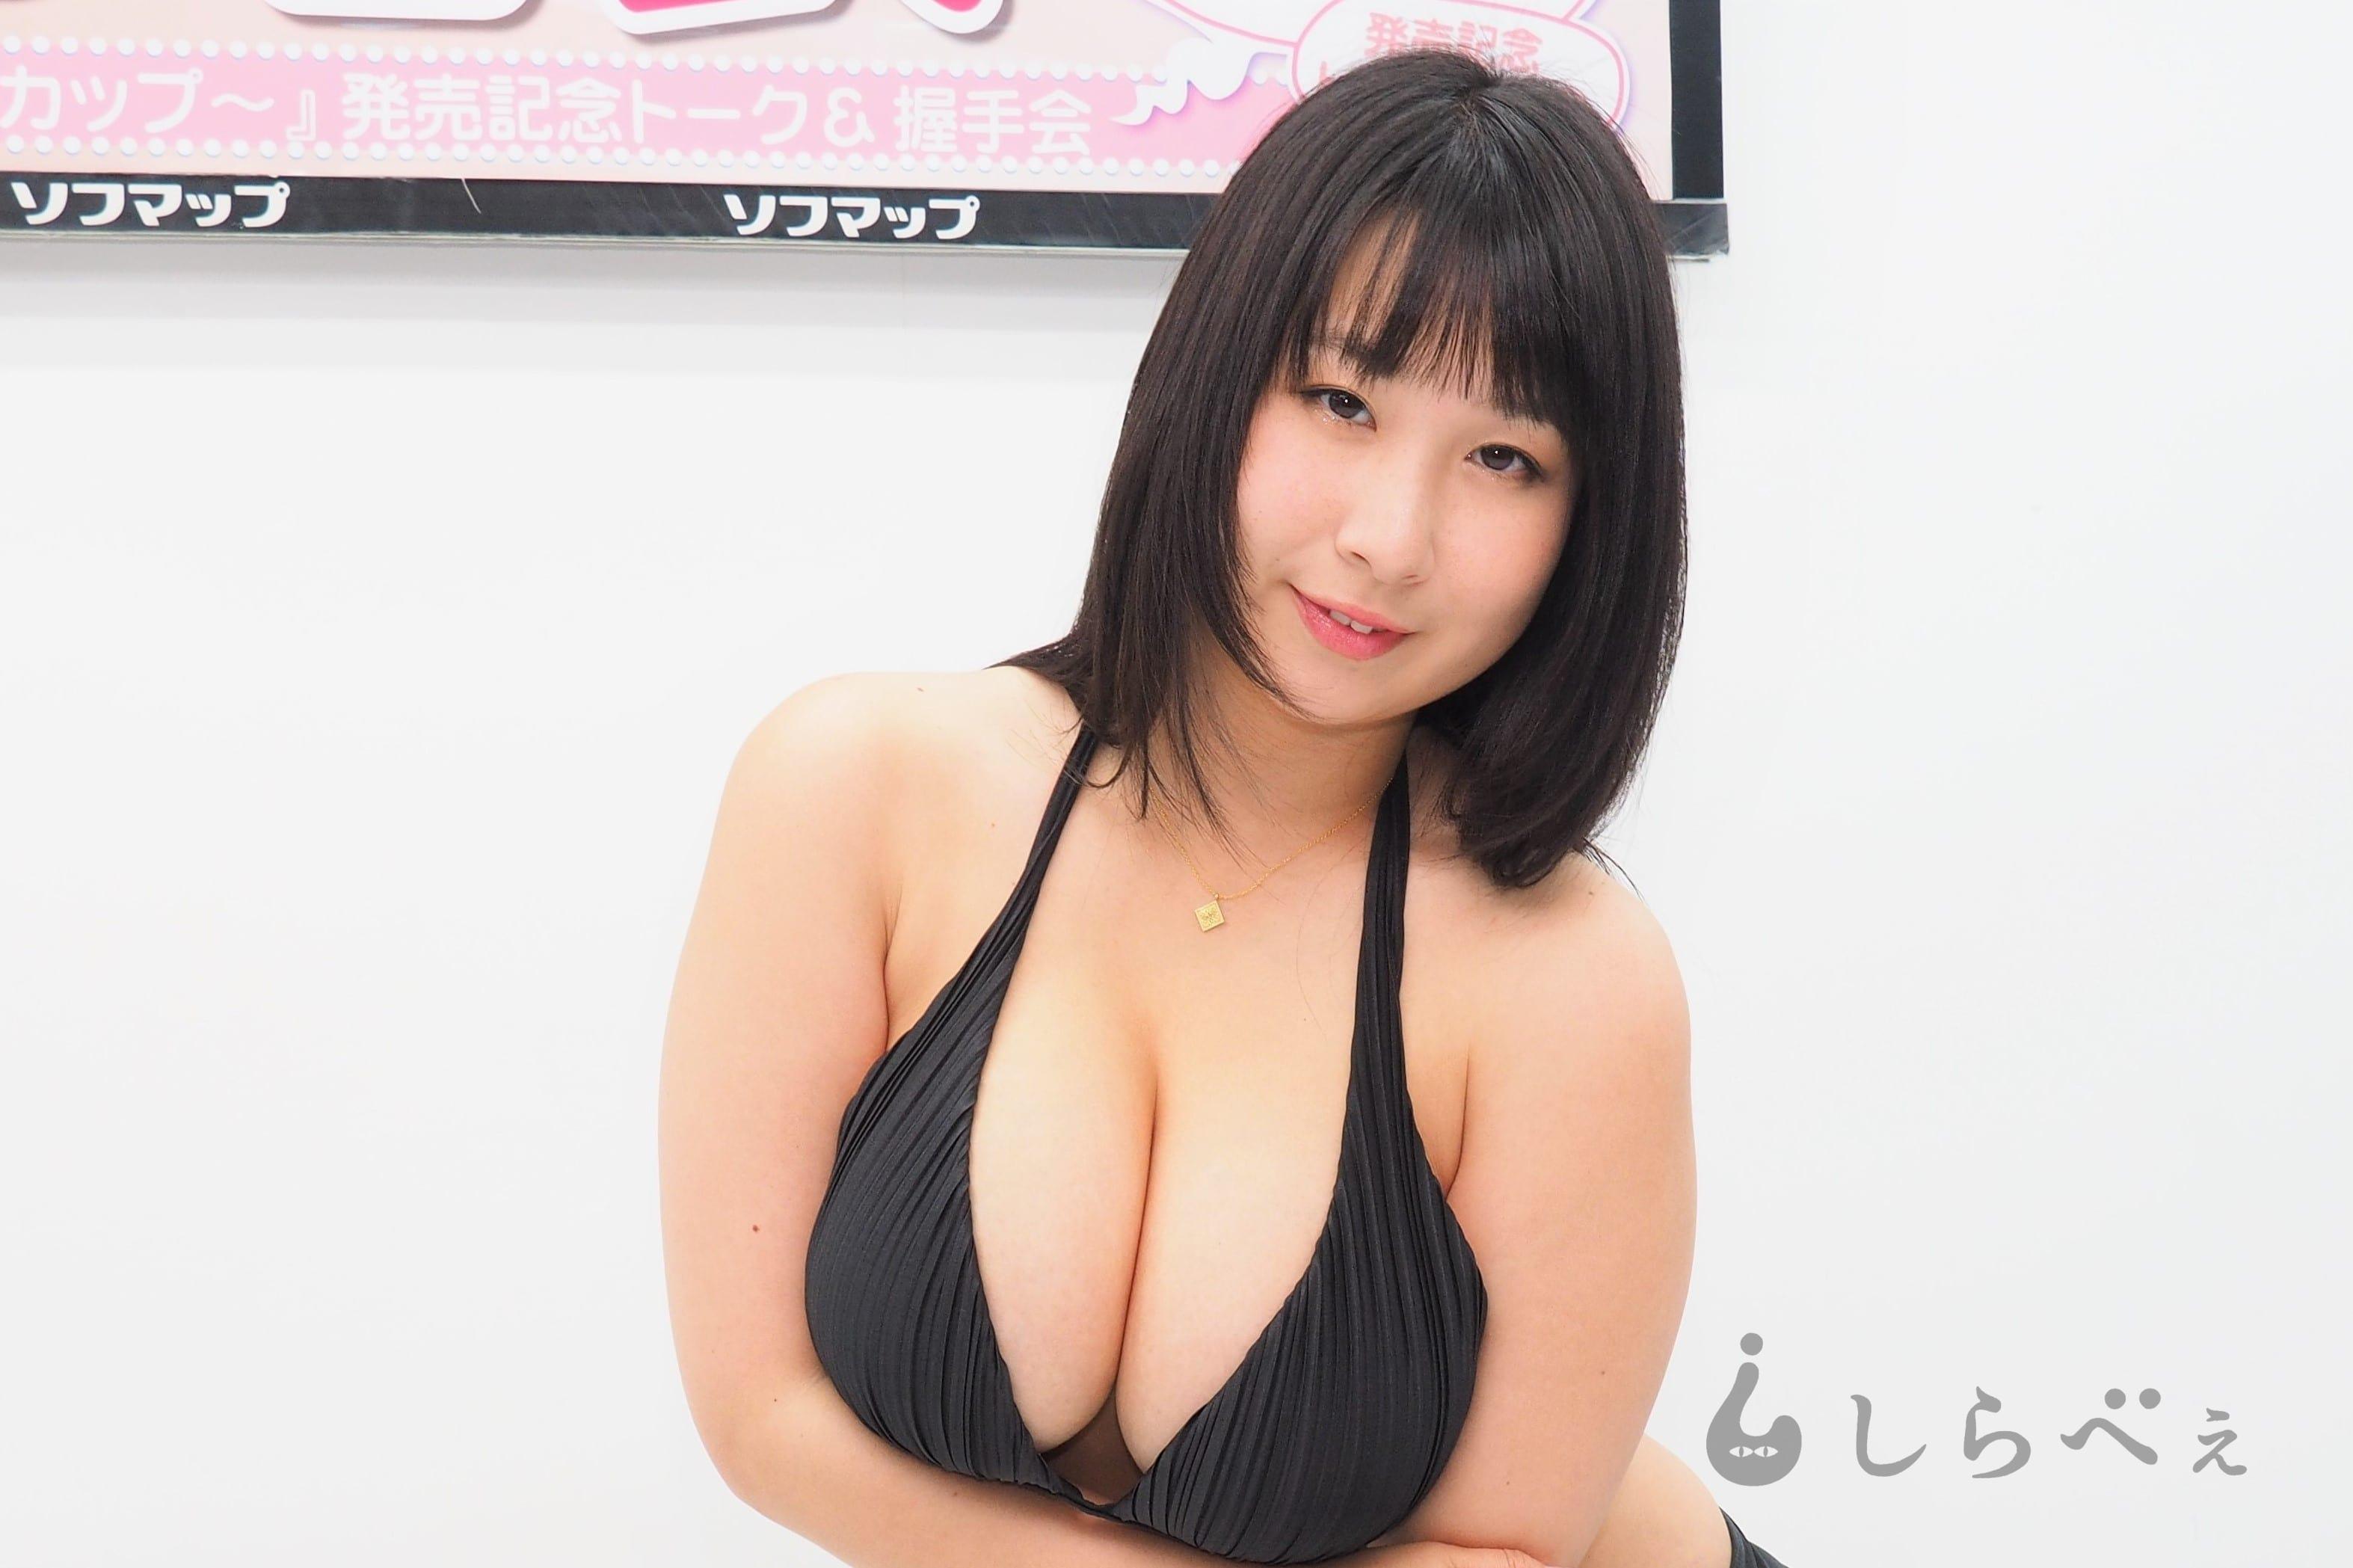 73001418_sirabee20180604kiriyama1.jpg